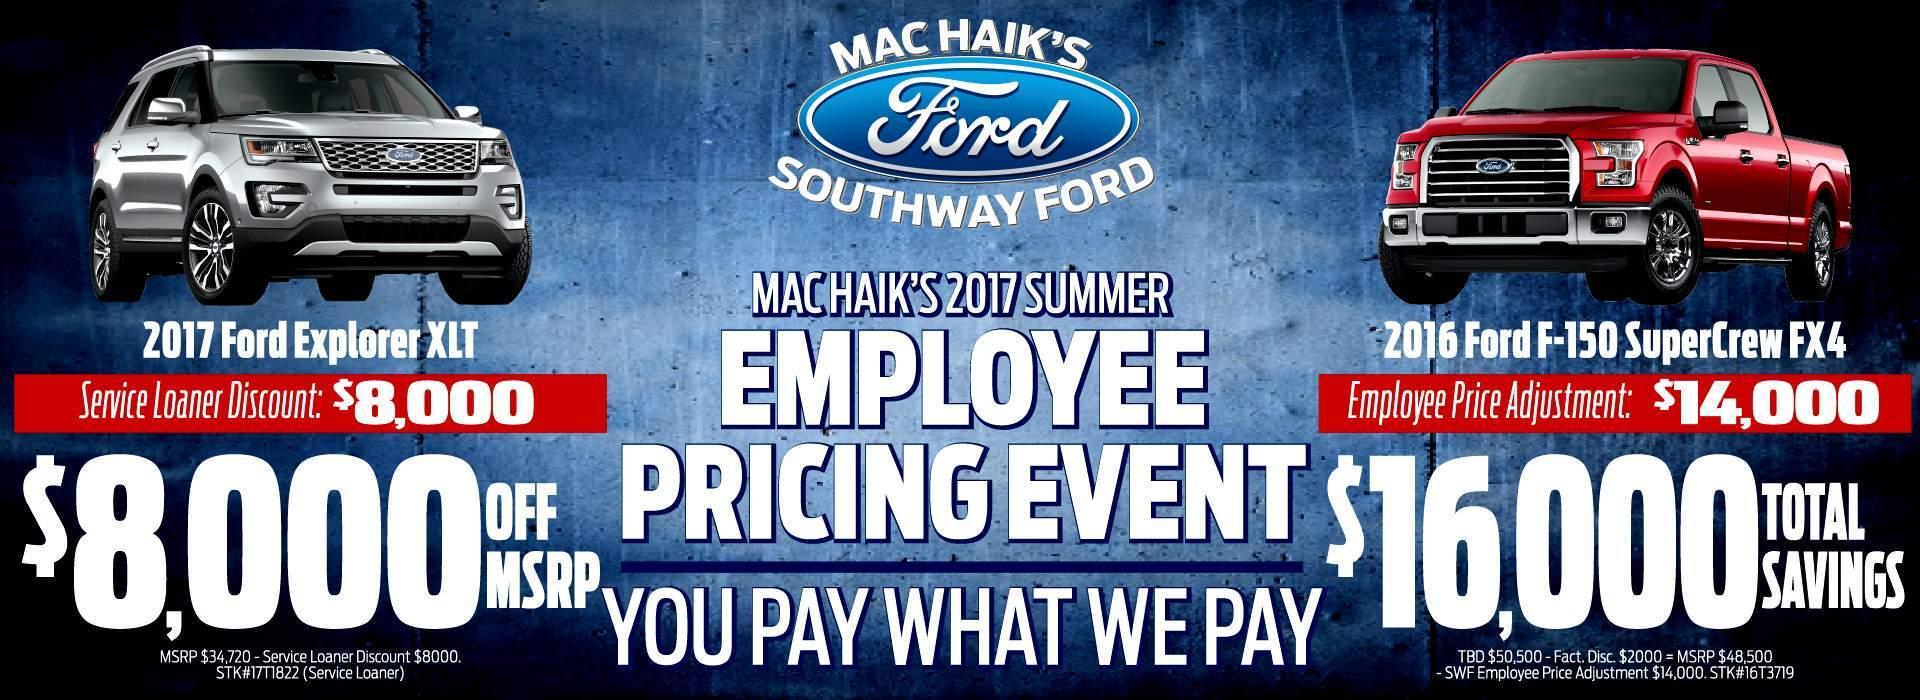 Mac Haik Victoria Tx >> Ford Dealership San Antonio TX Used Cars Mac Haik Southway ...